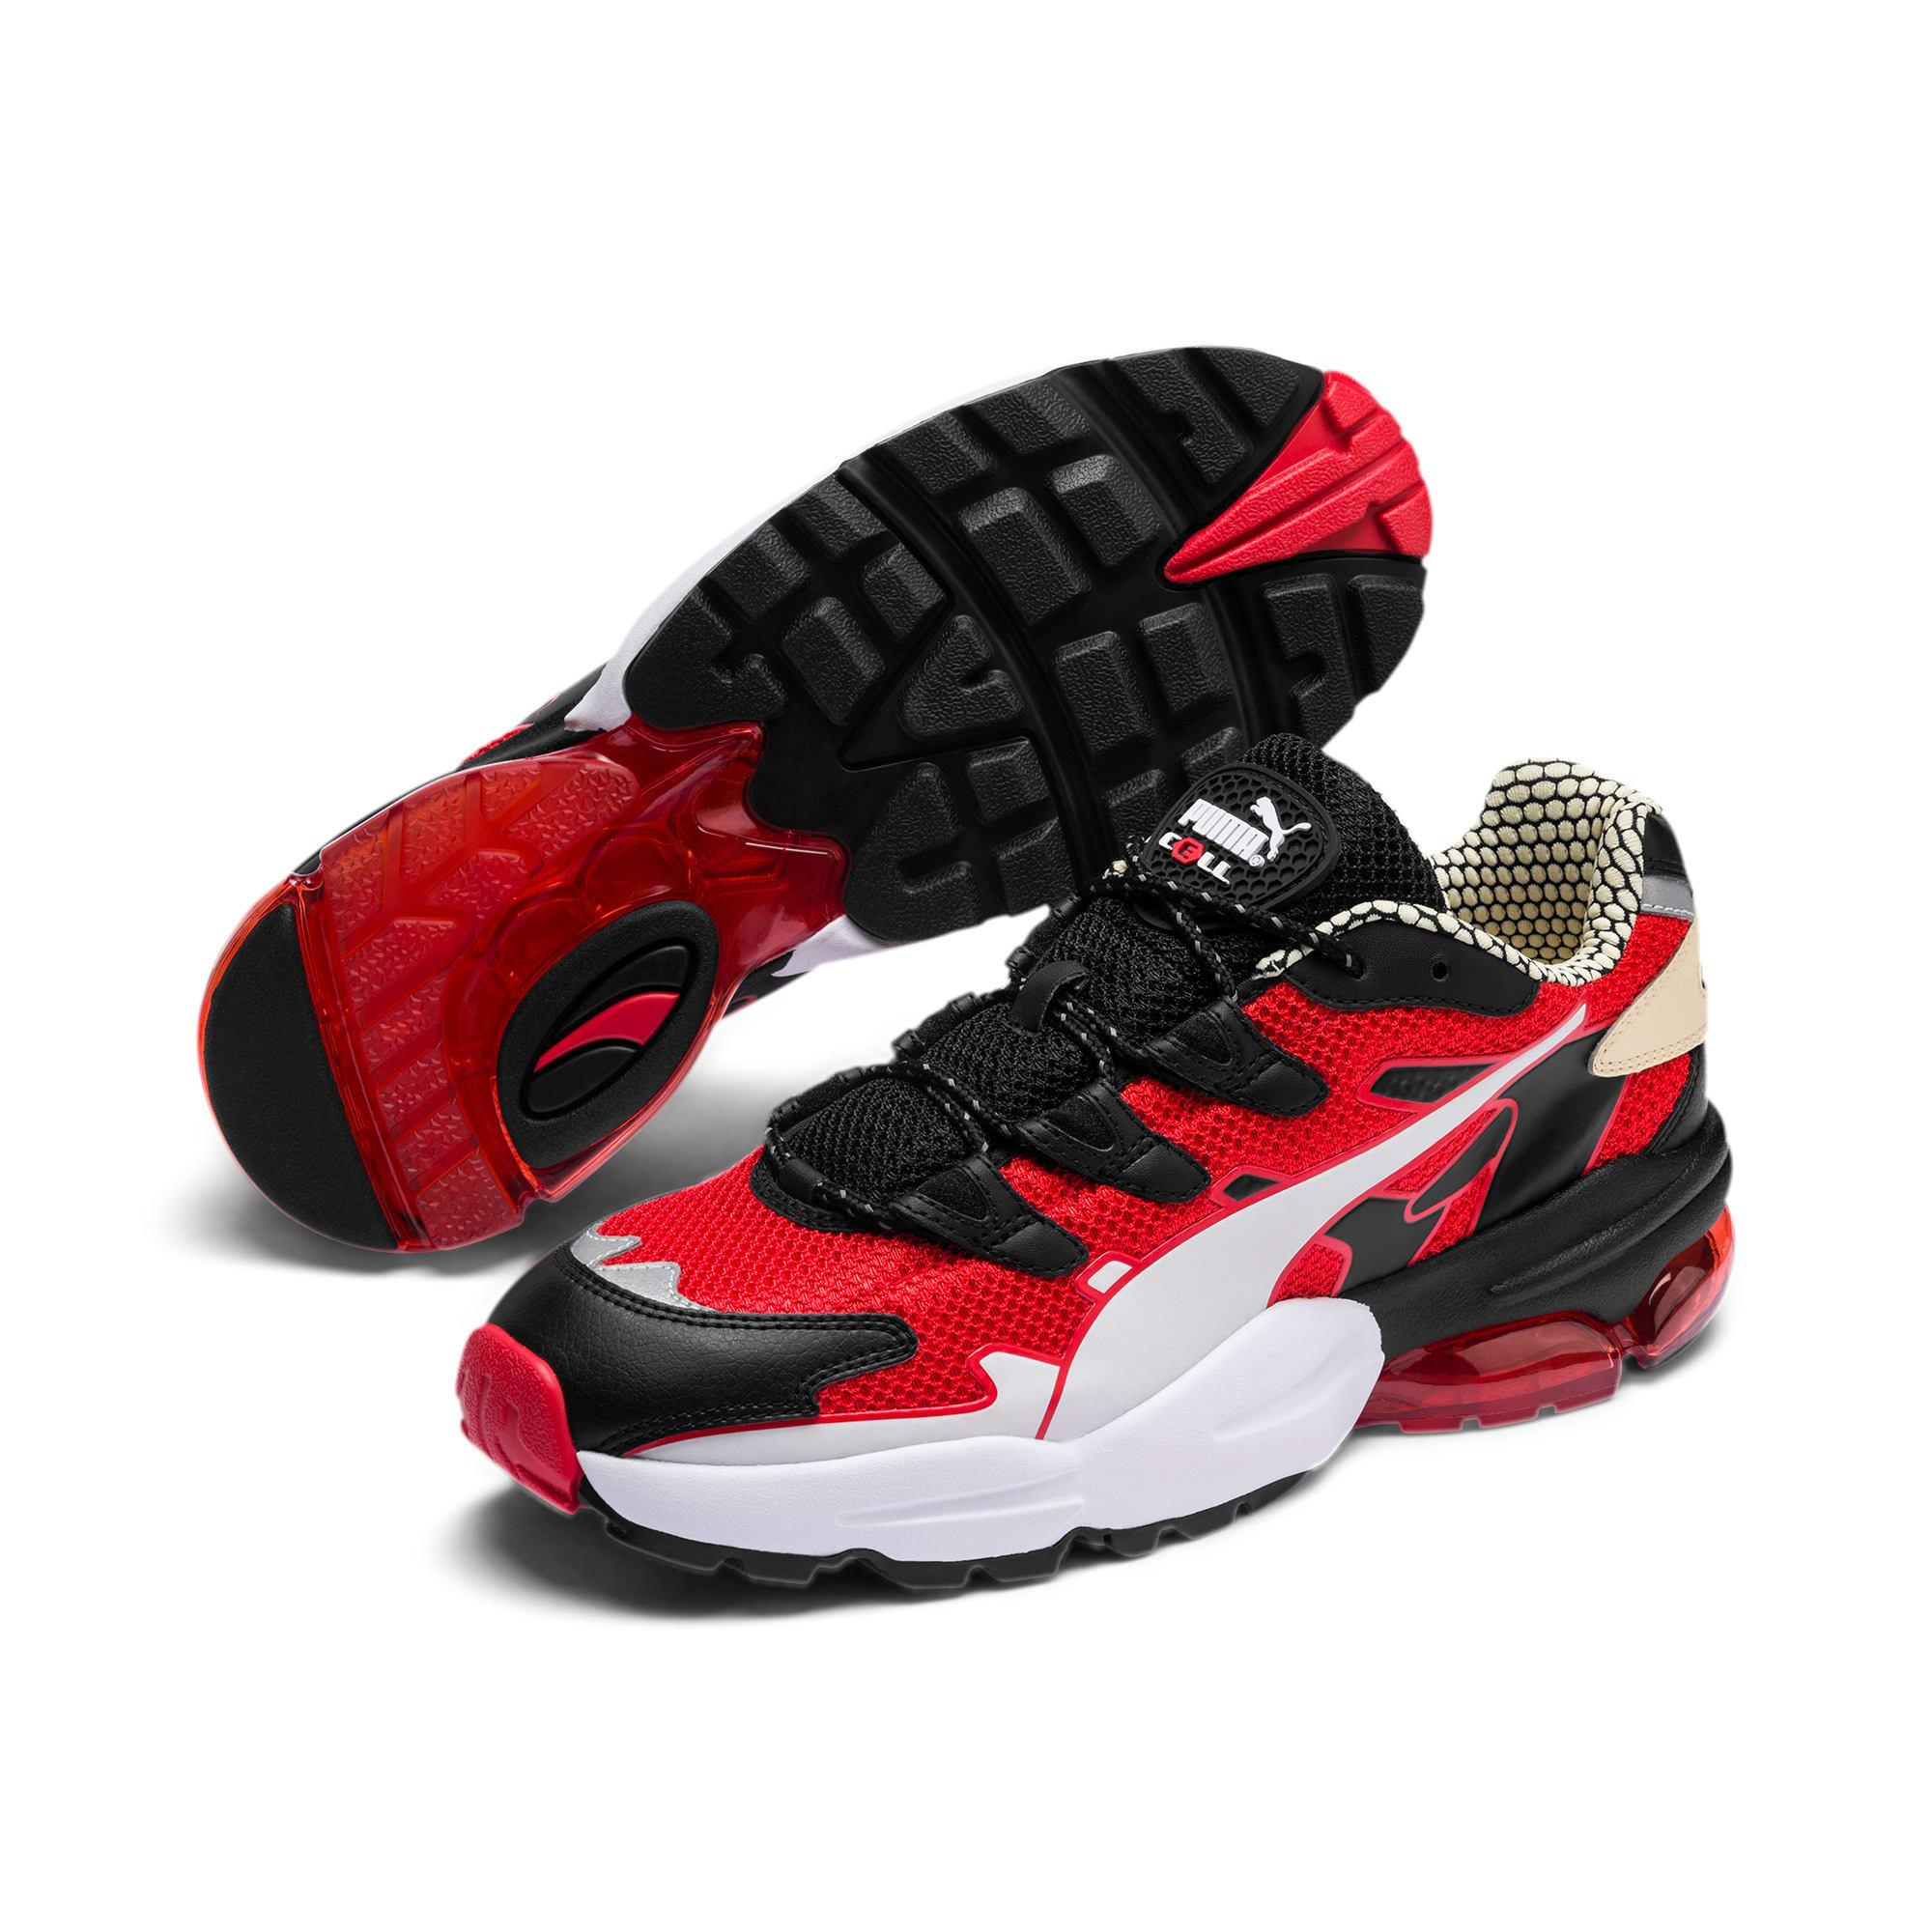 Thumbnail 3 of CELL Alien Kotto Sneakers, High Risk Red-Puma Black, medium